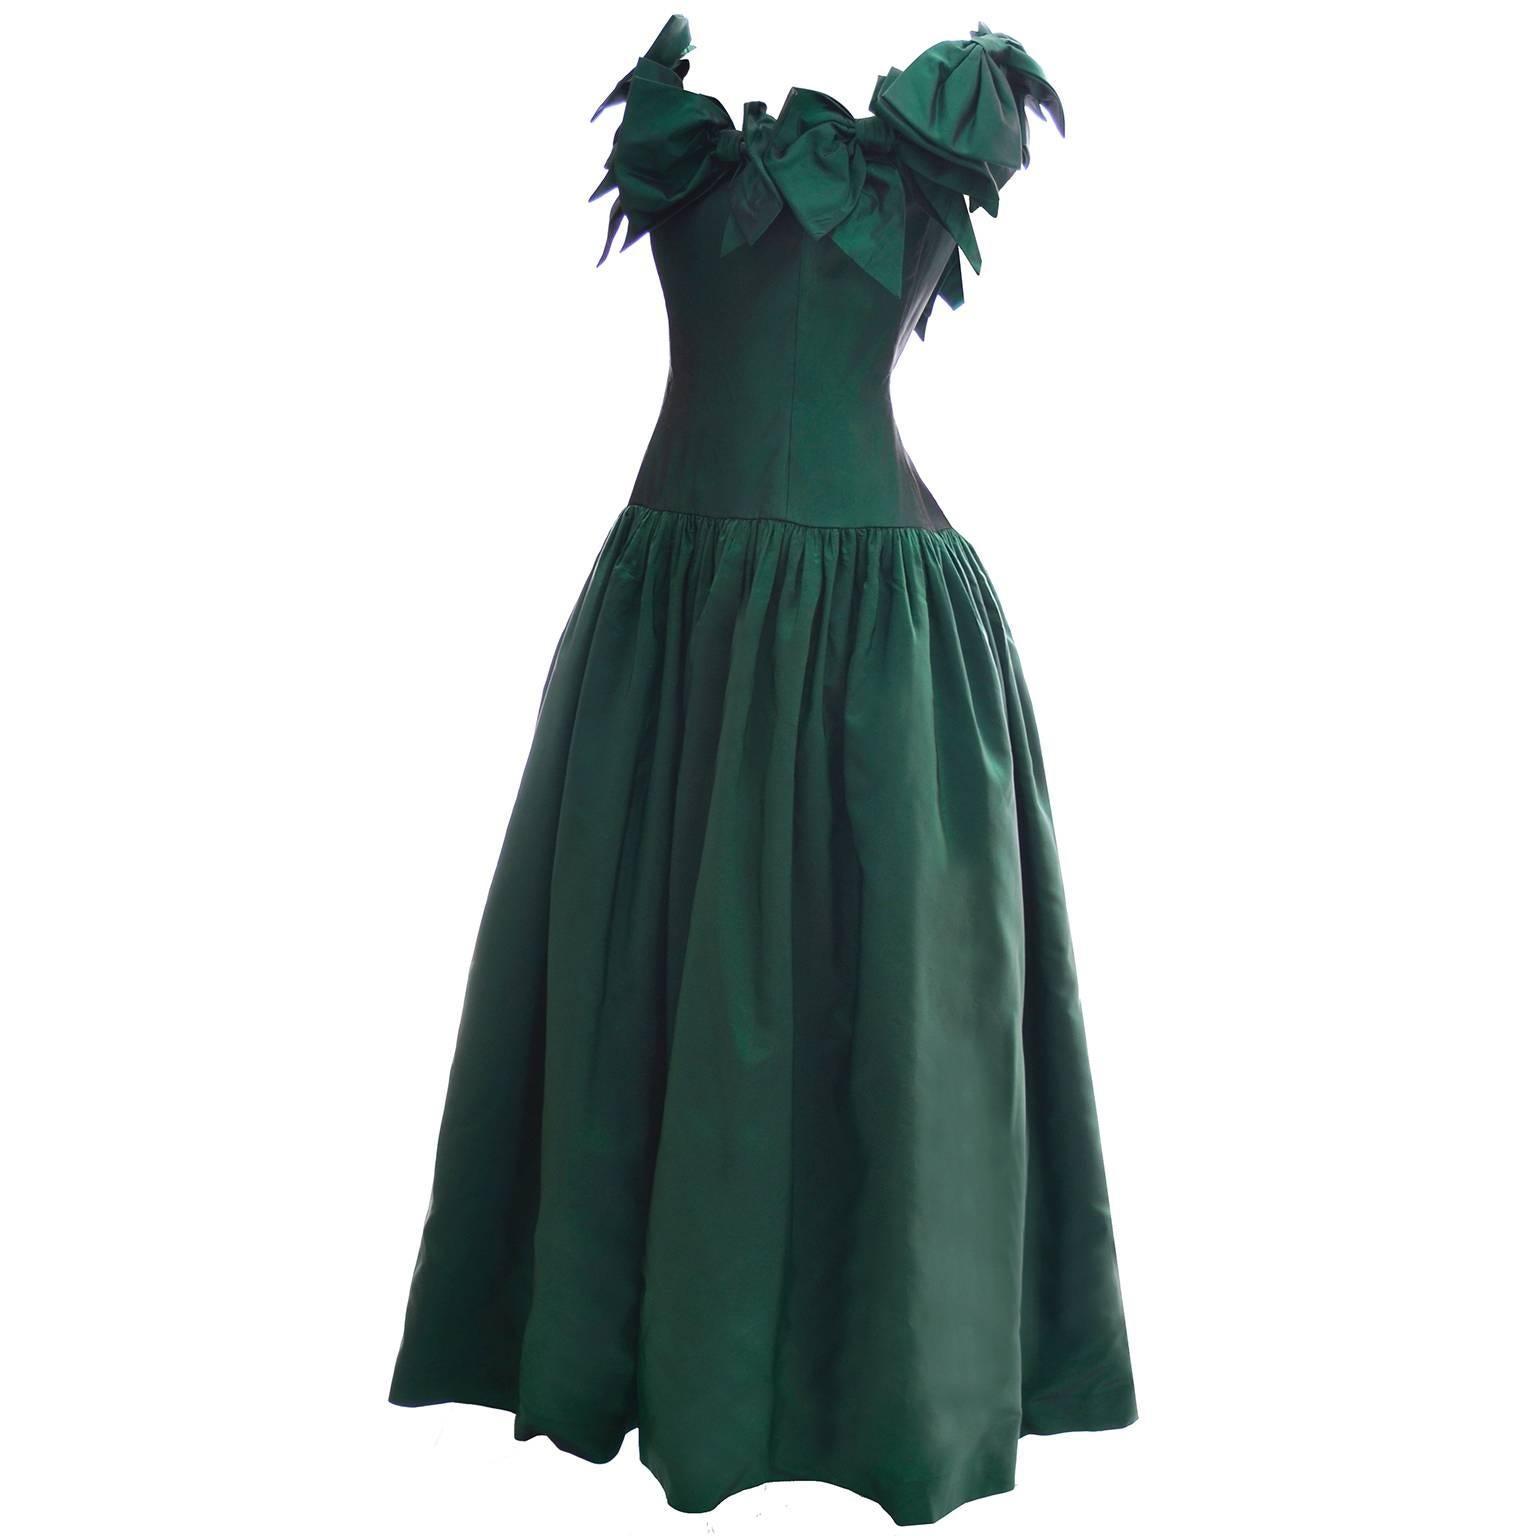 Victor Costa 1980s Vintage Dress Iridescent Green Ballgown Evening ...